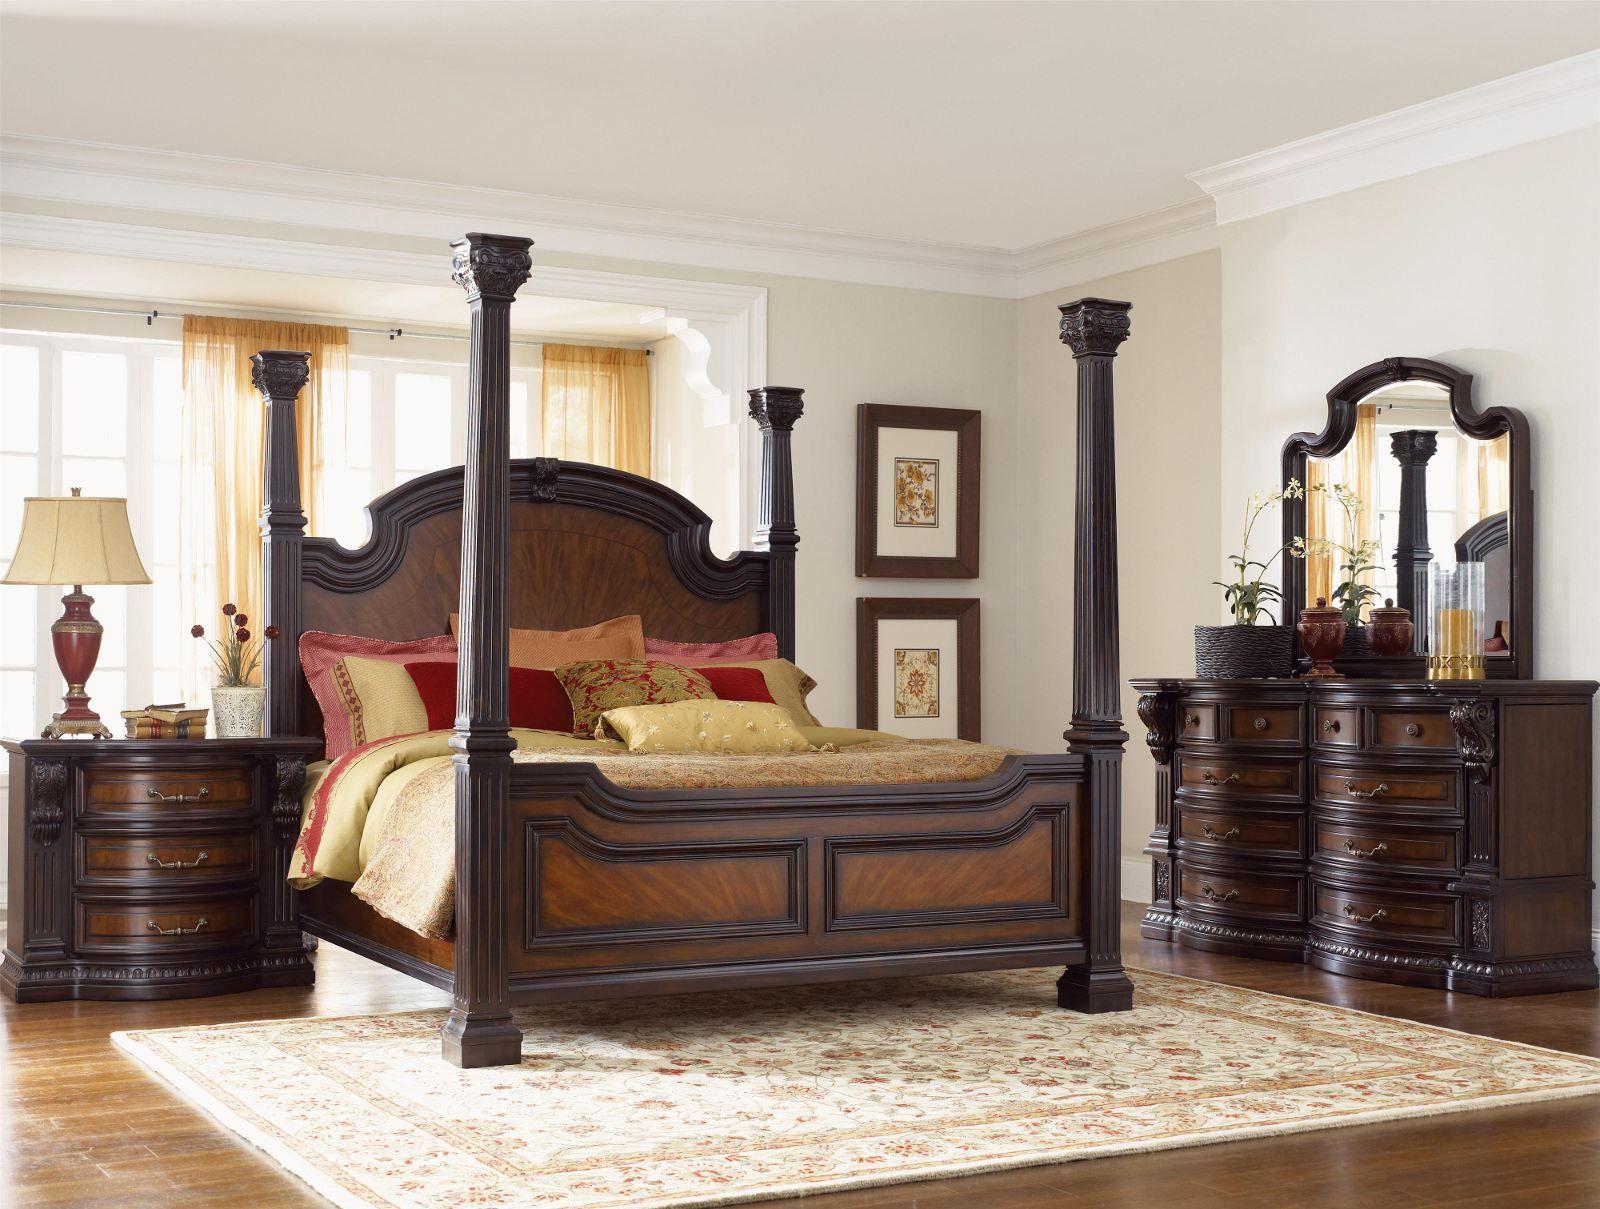 Fairmont Designs Bedroom Sets Inspiration Fairmont Designs Grand Estates 4Pc Poster Bedroom Set In Cinnamon Design Decoration